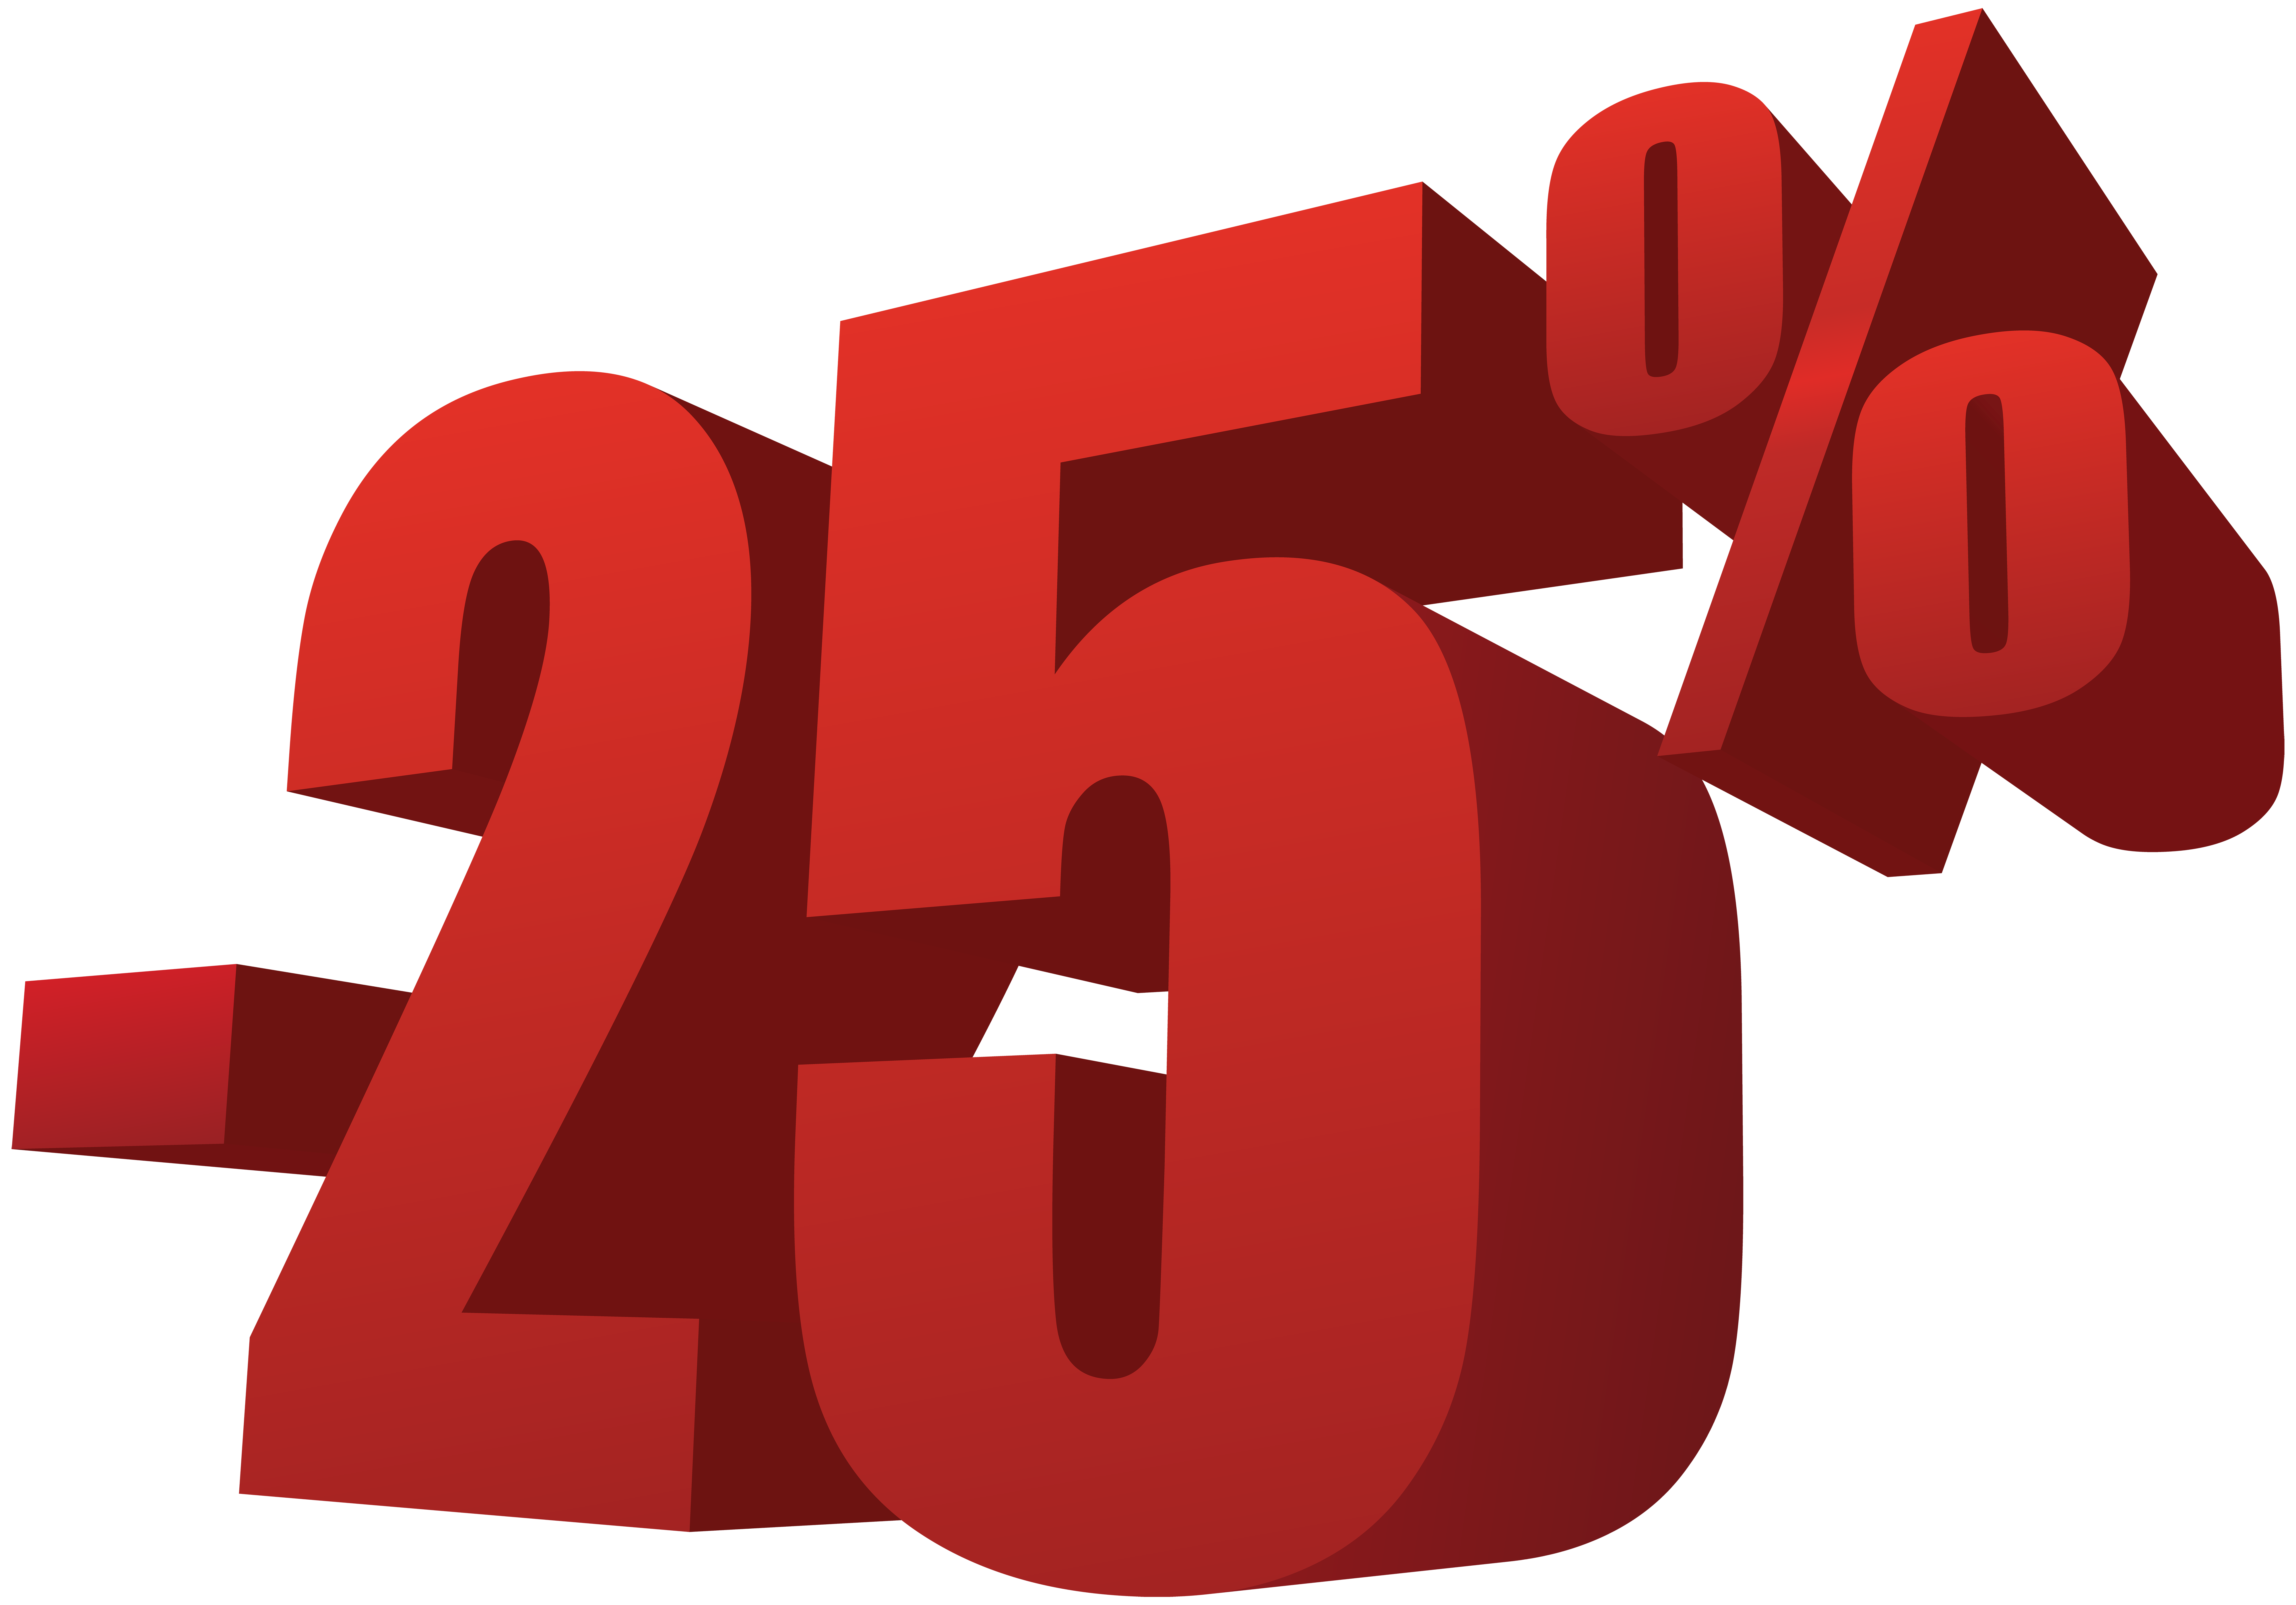 25% Off Sale PNG Transparent Image.